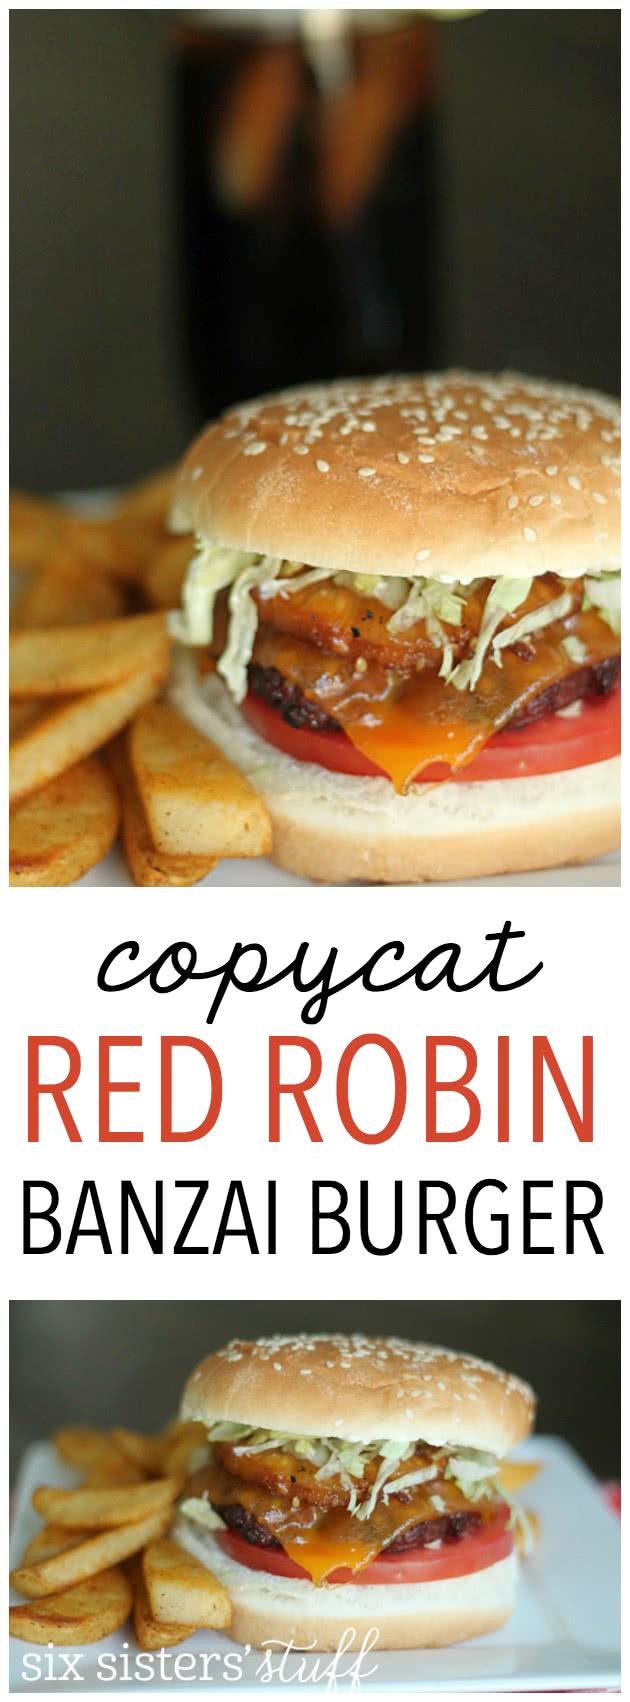 Copycat Red Robin Banzai Burger from SixSistersStuff.com